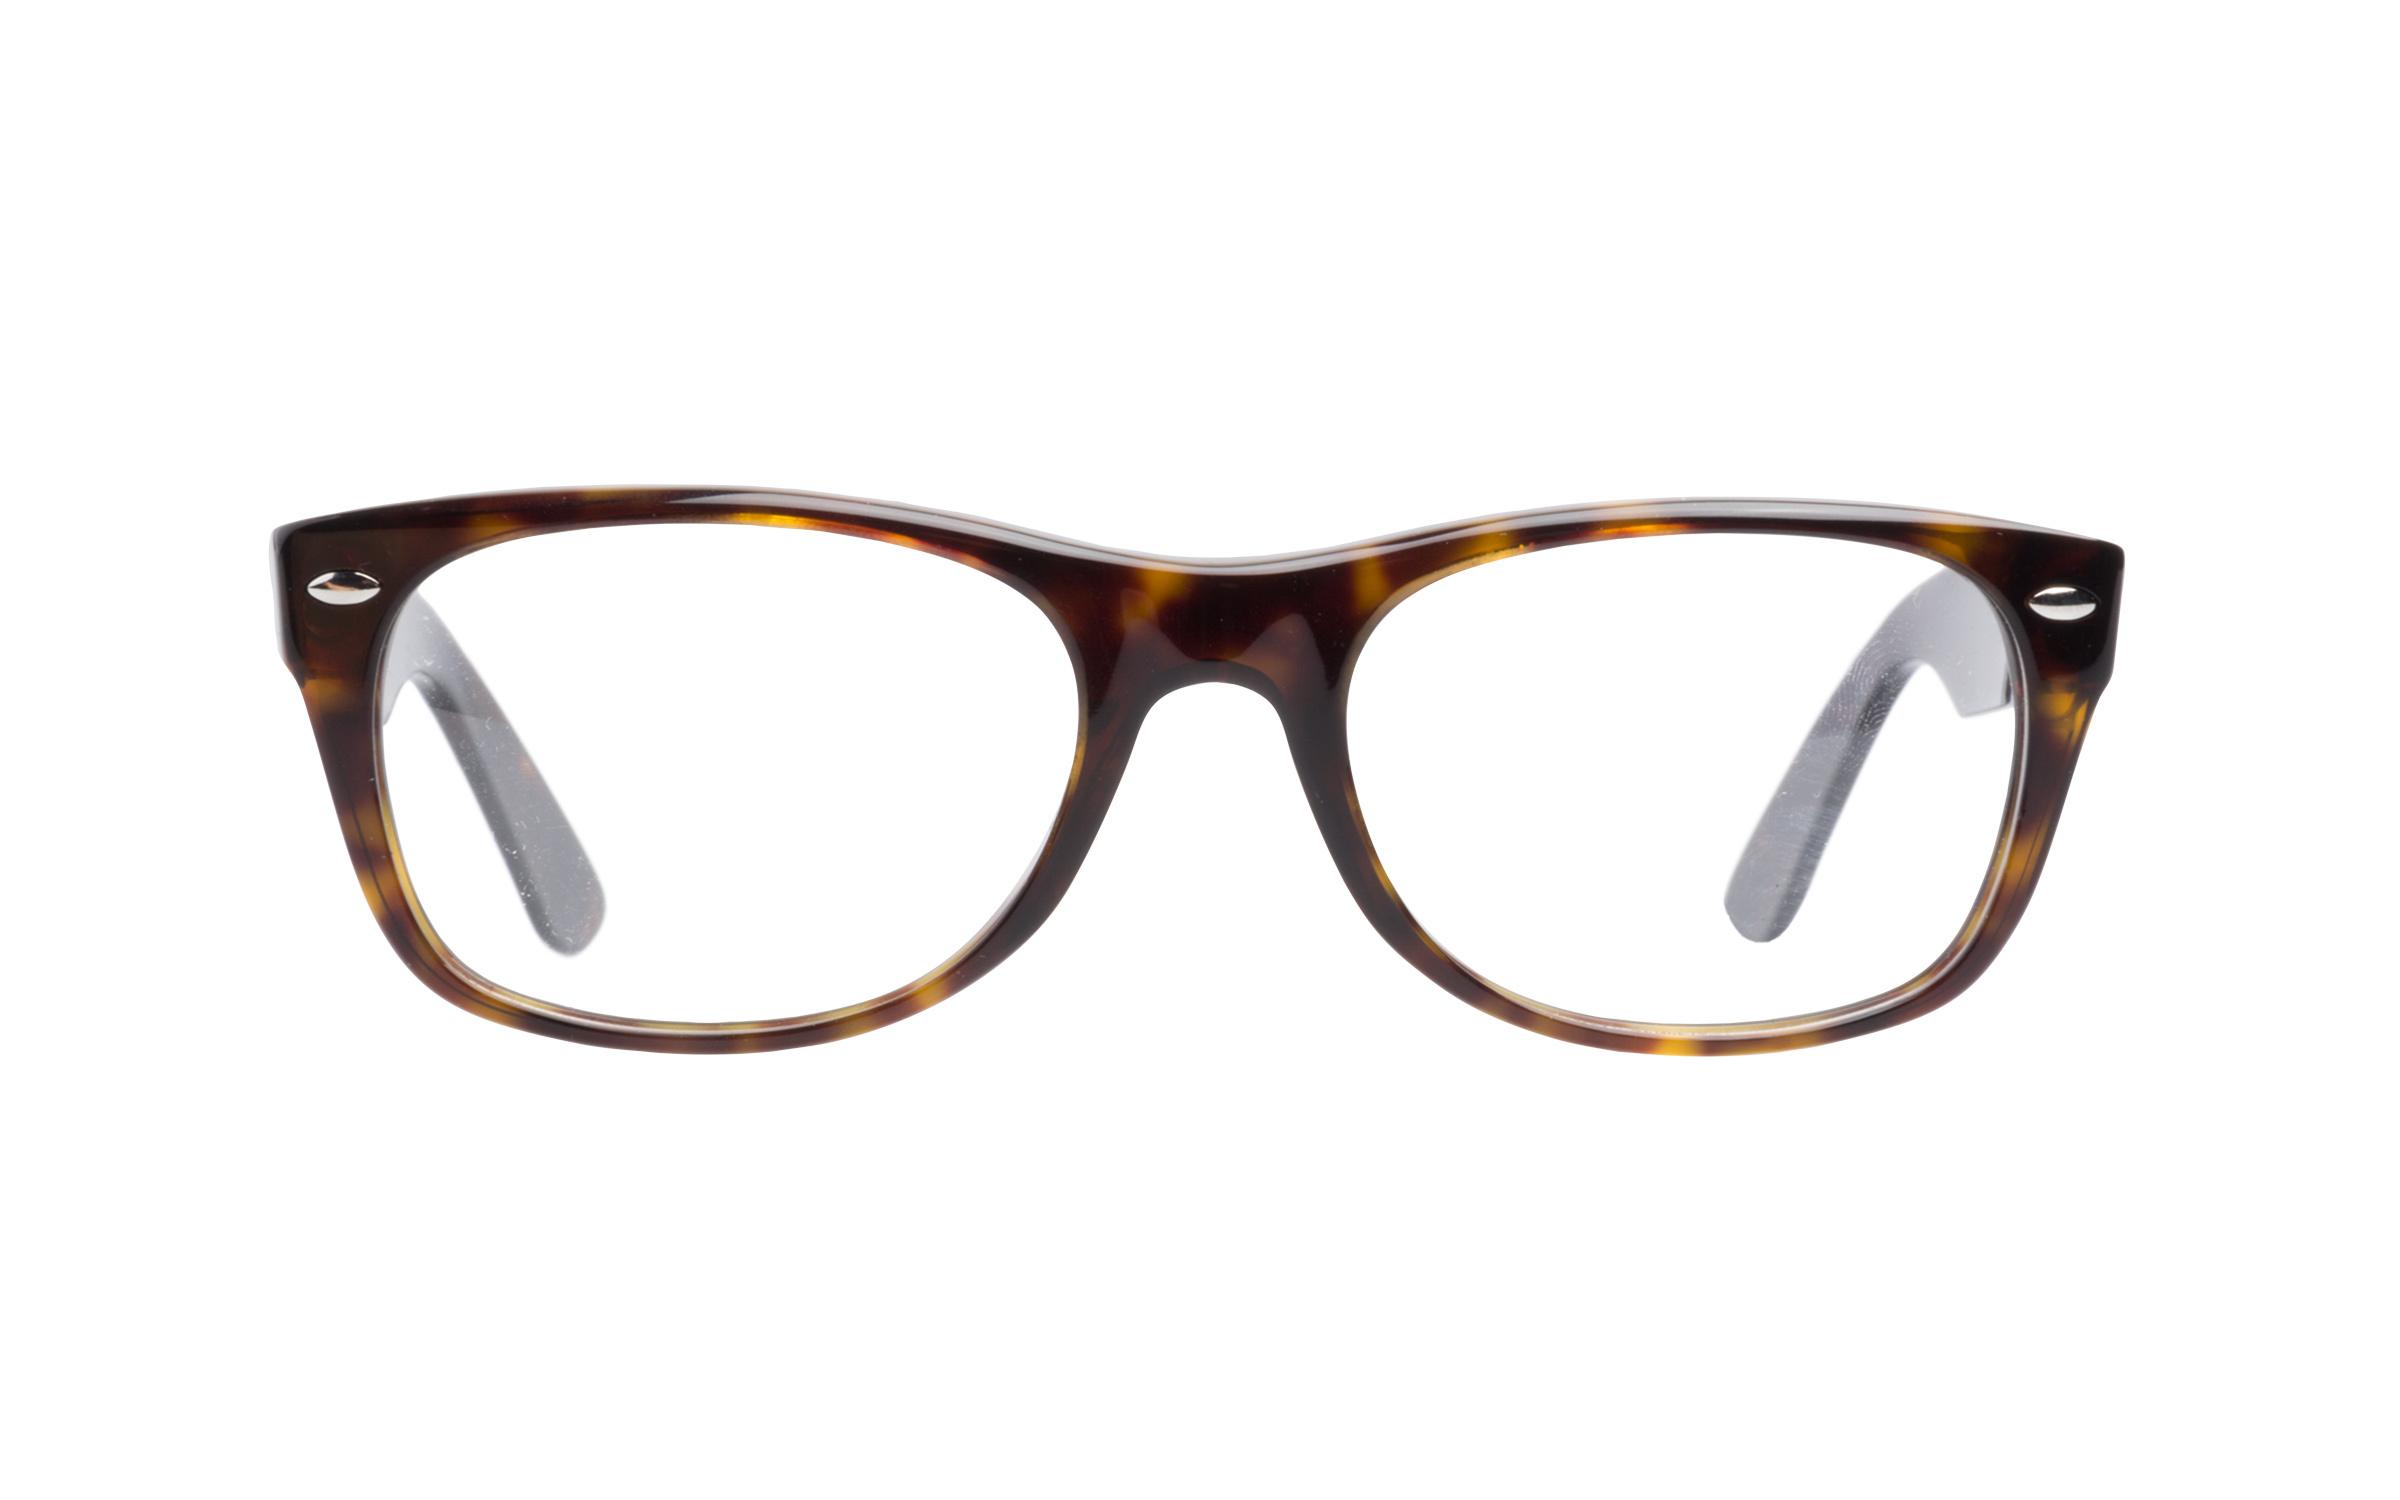 Ray-Ban Glasses Classic Brown/Tortoise Acetate Online Coastal